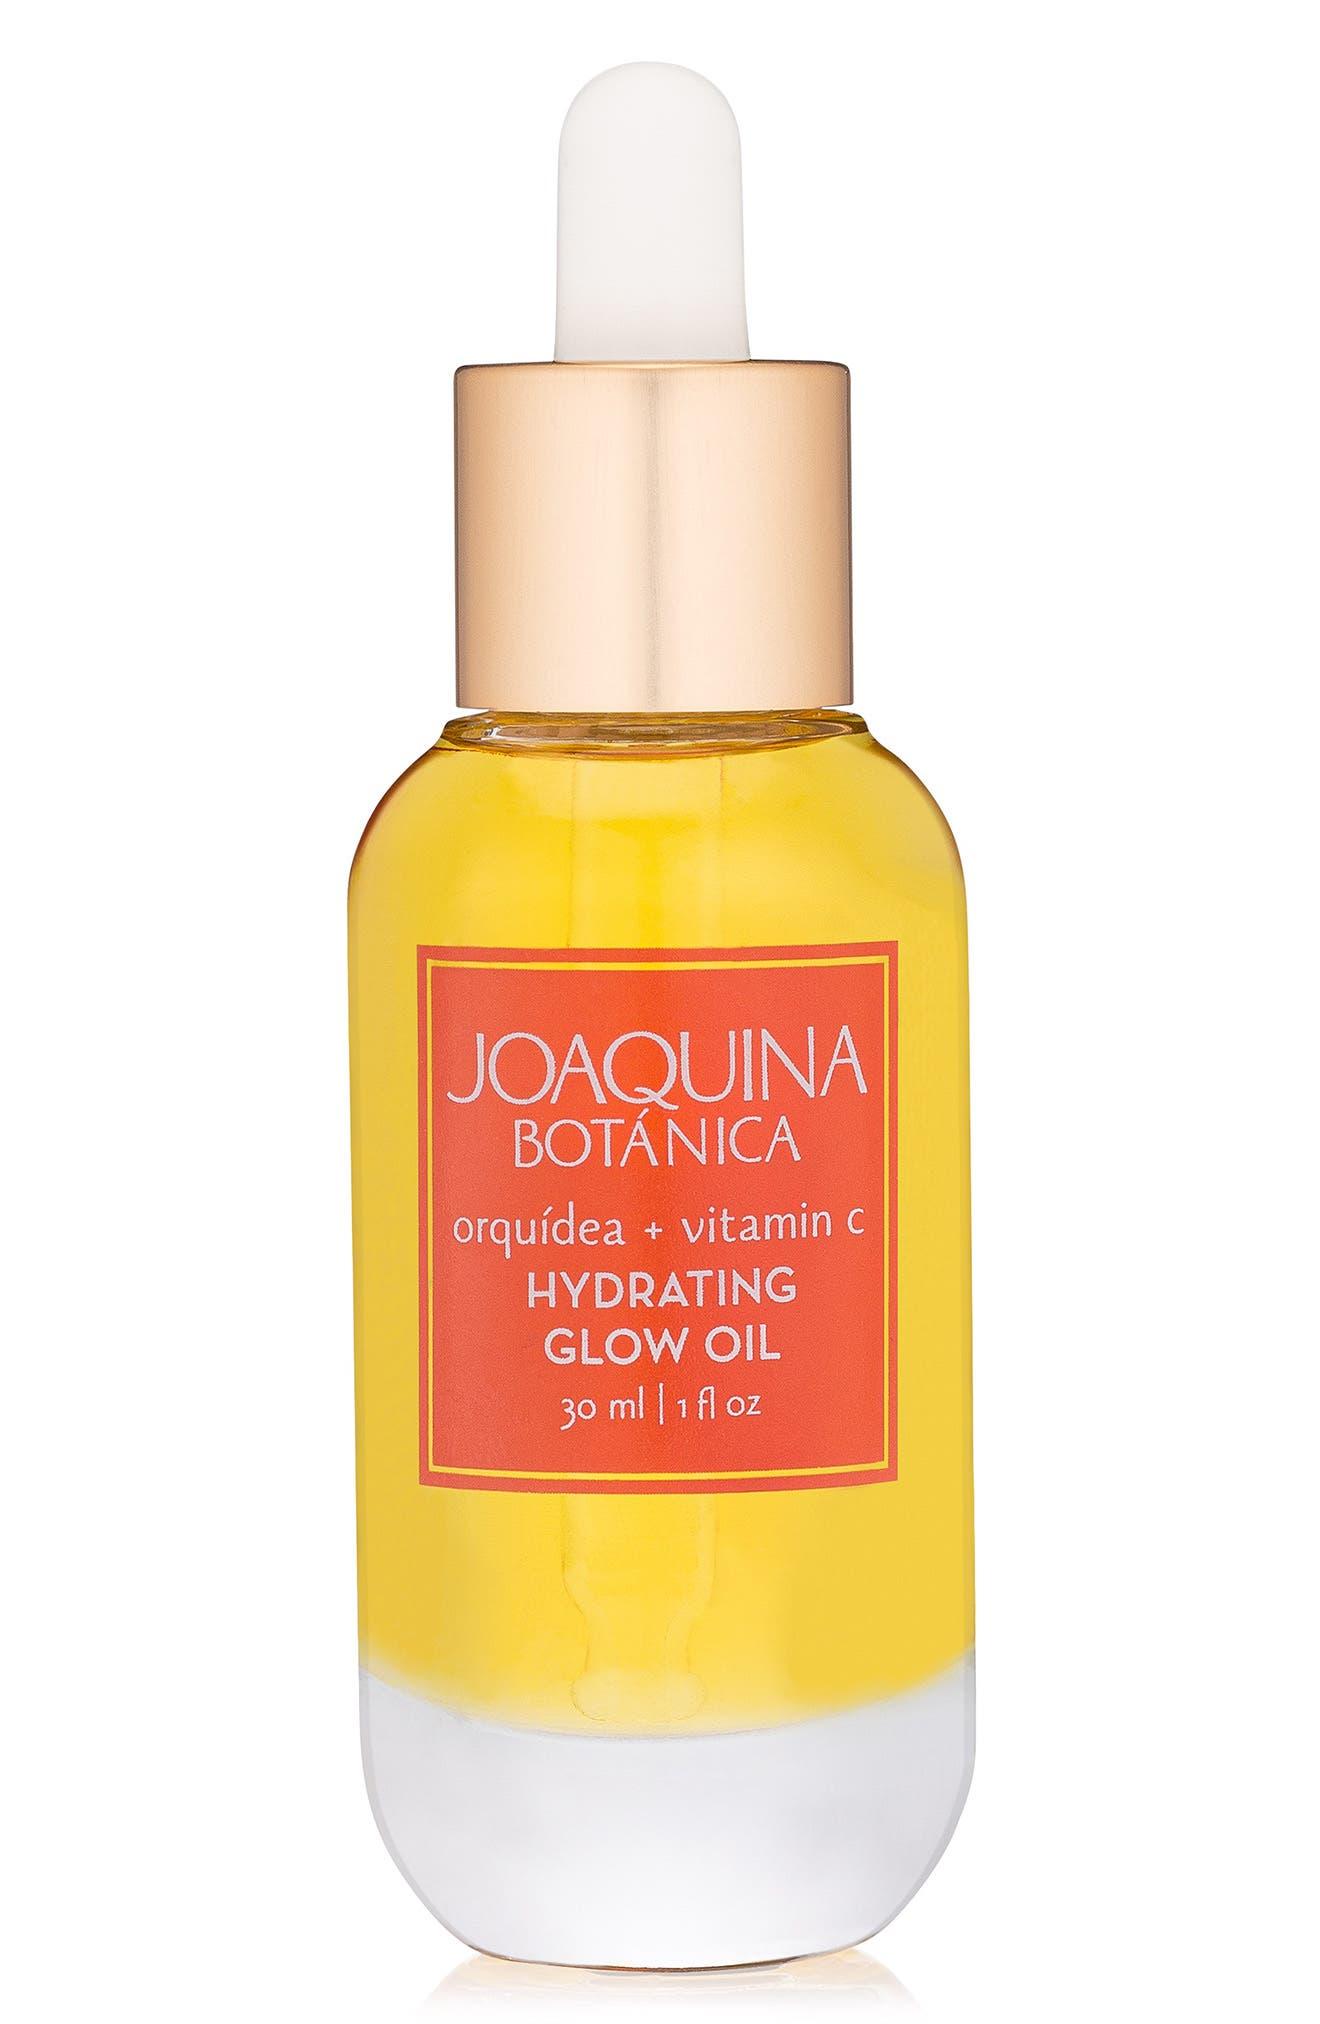 Joaquina Botanica Hydrating Glow Oil